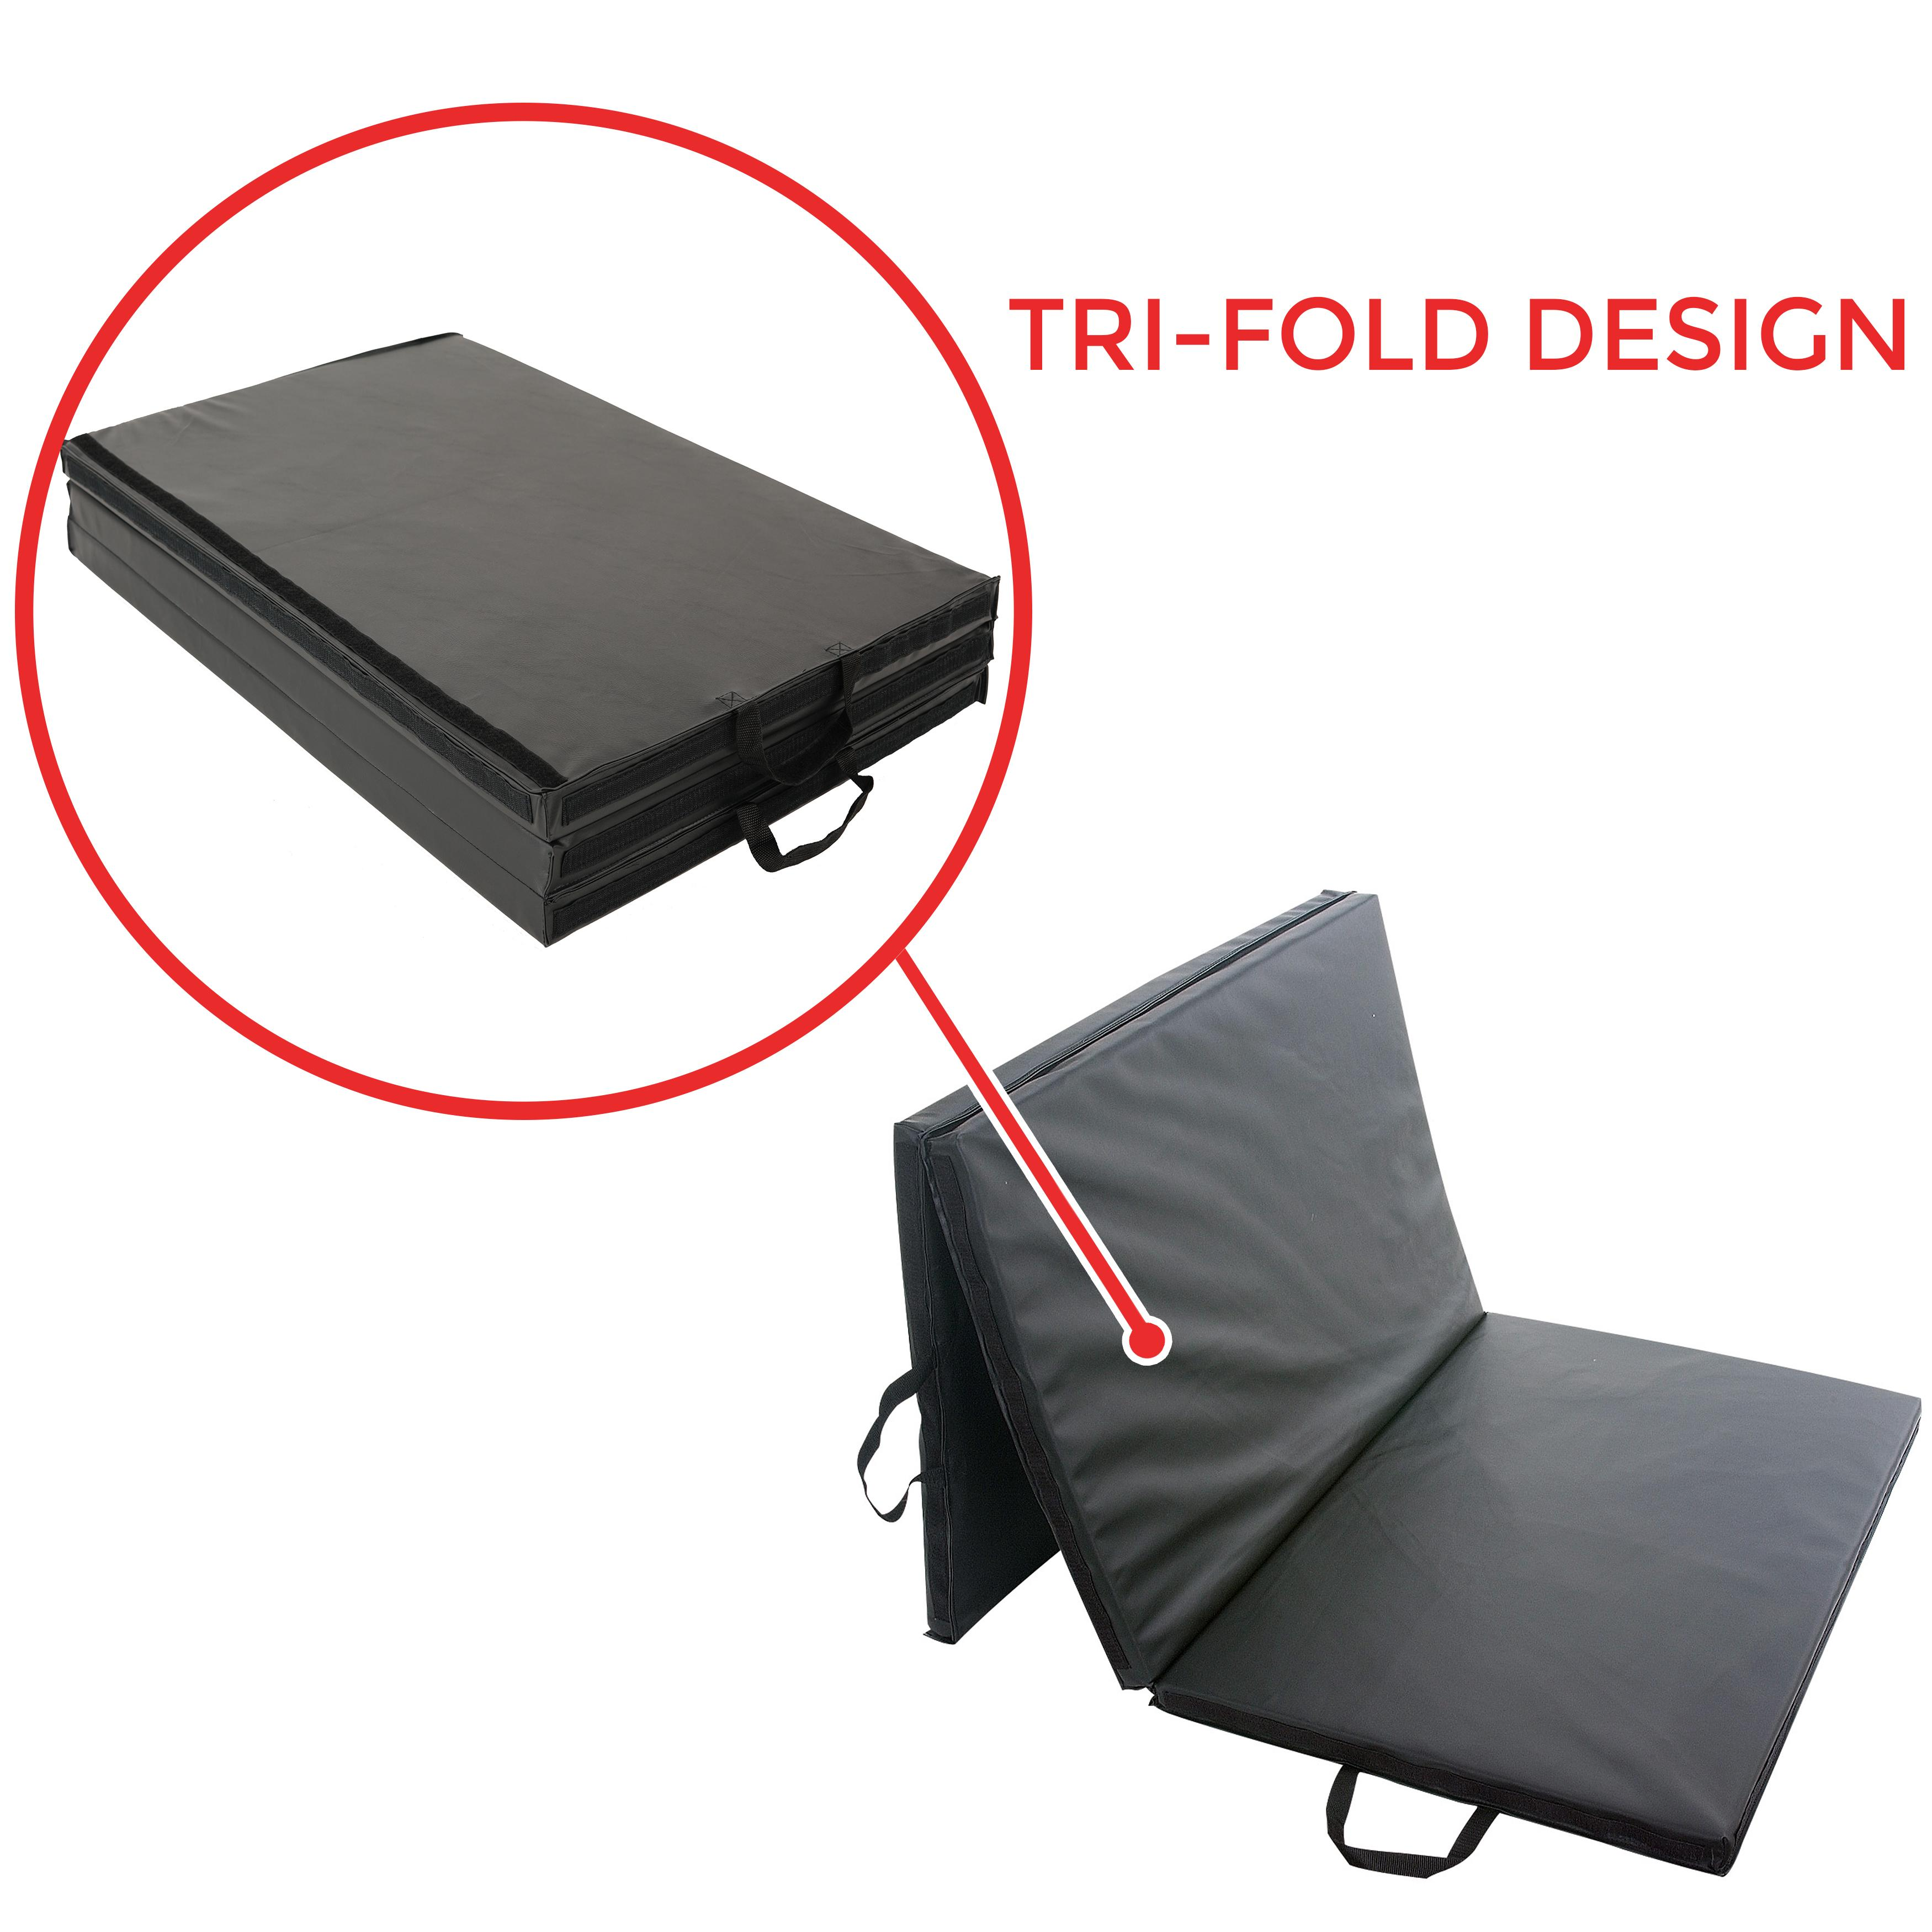 Amazon.com : Sunny Folding Gym Mat : Exercise Mats